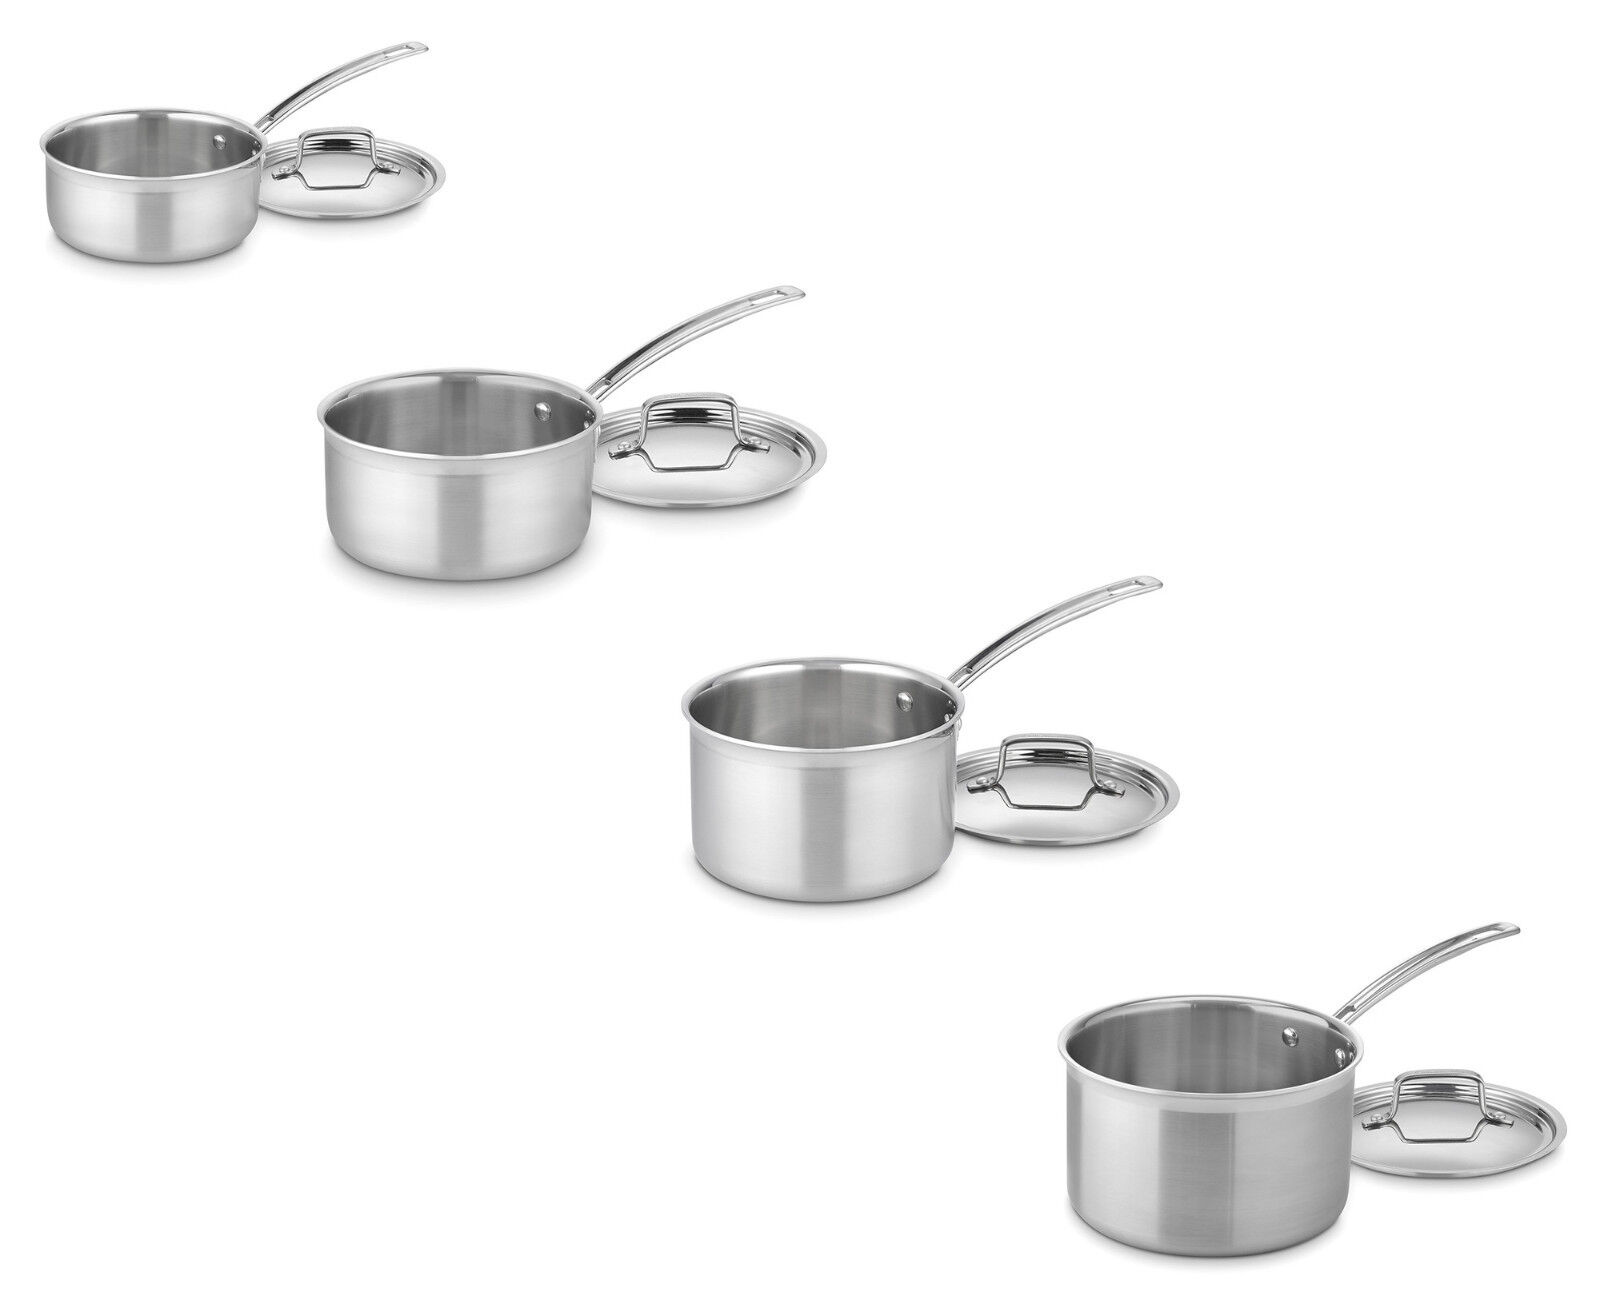 Cuisinart MultiClad Pro Stainless Steel 1.5, 2, 3, 4-Quart S